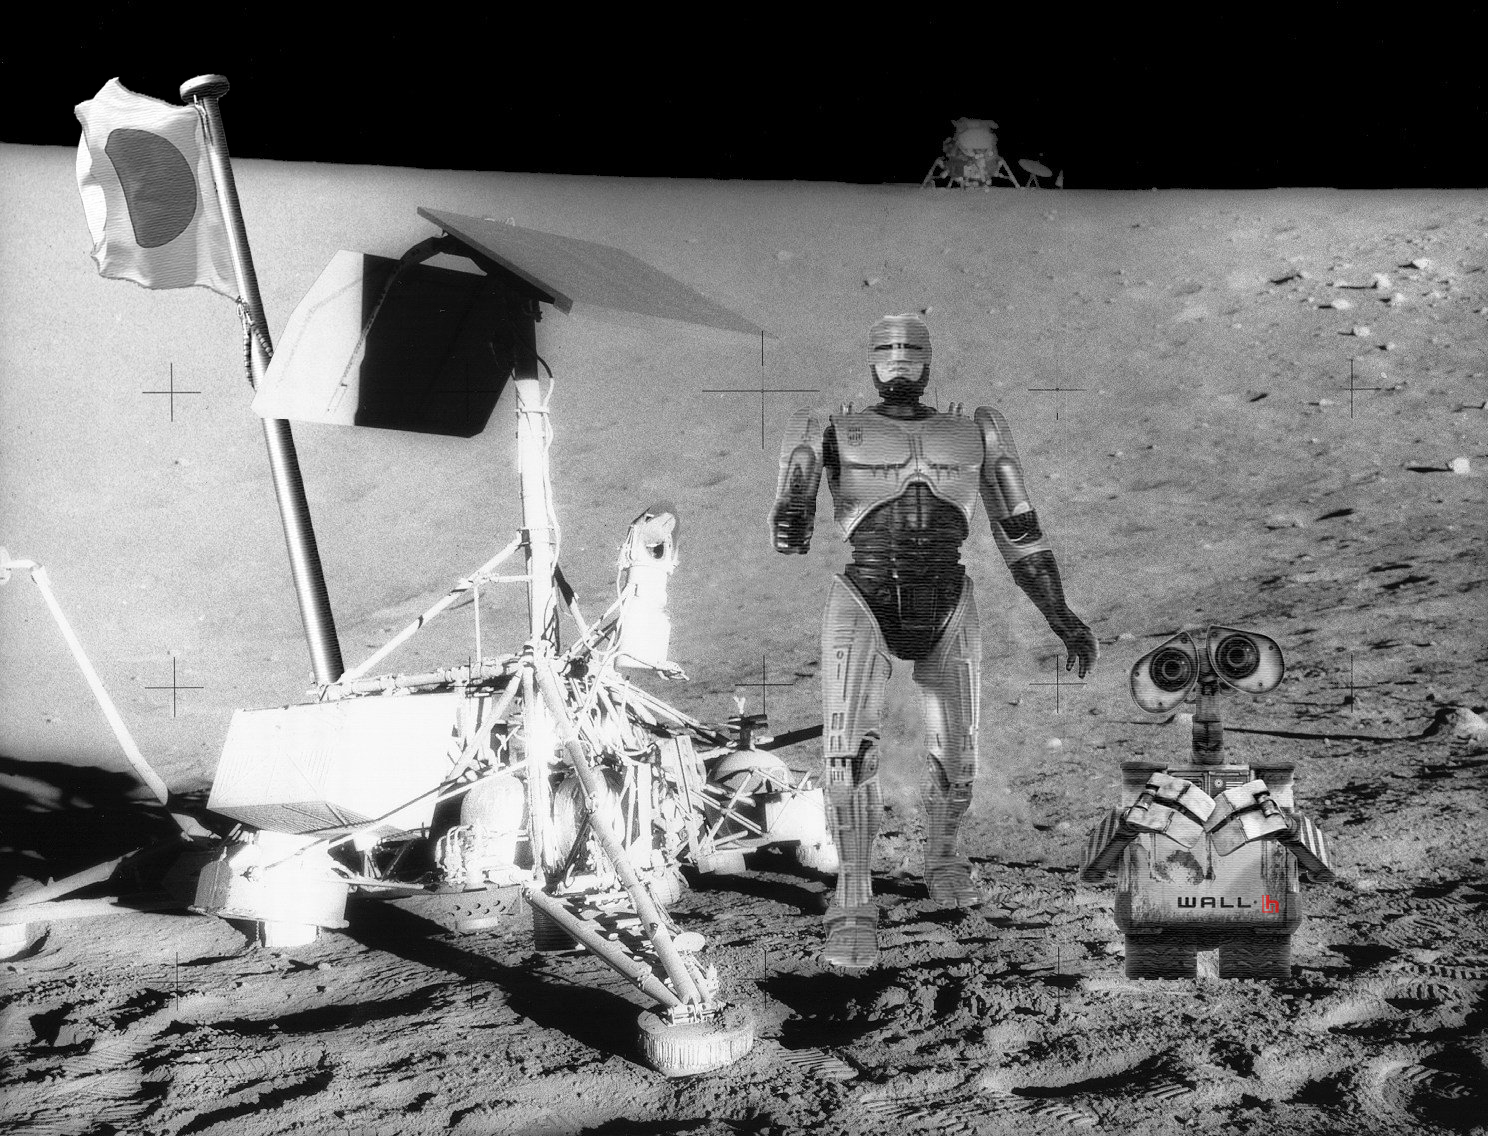 china lands on the moon historic robotic lunar landing - HD1488×1136